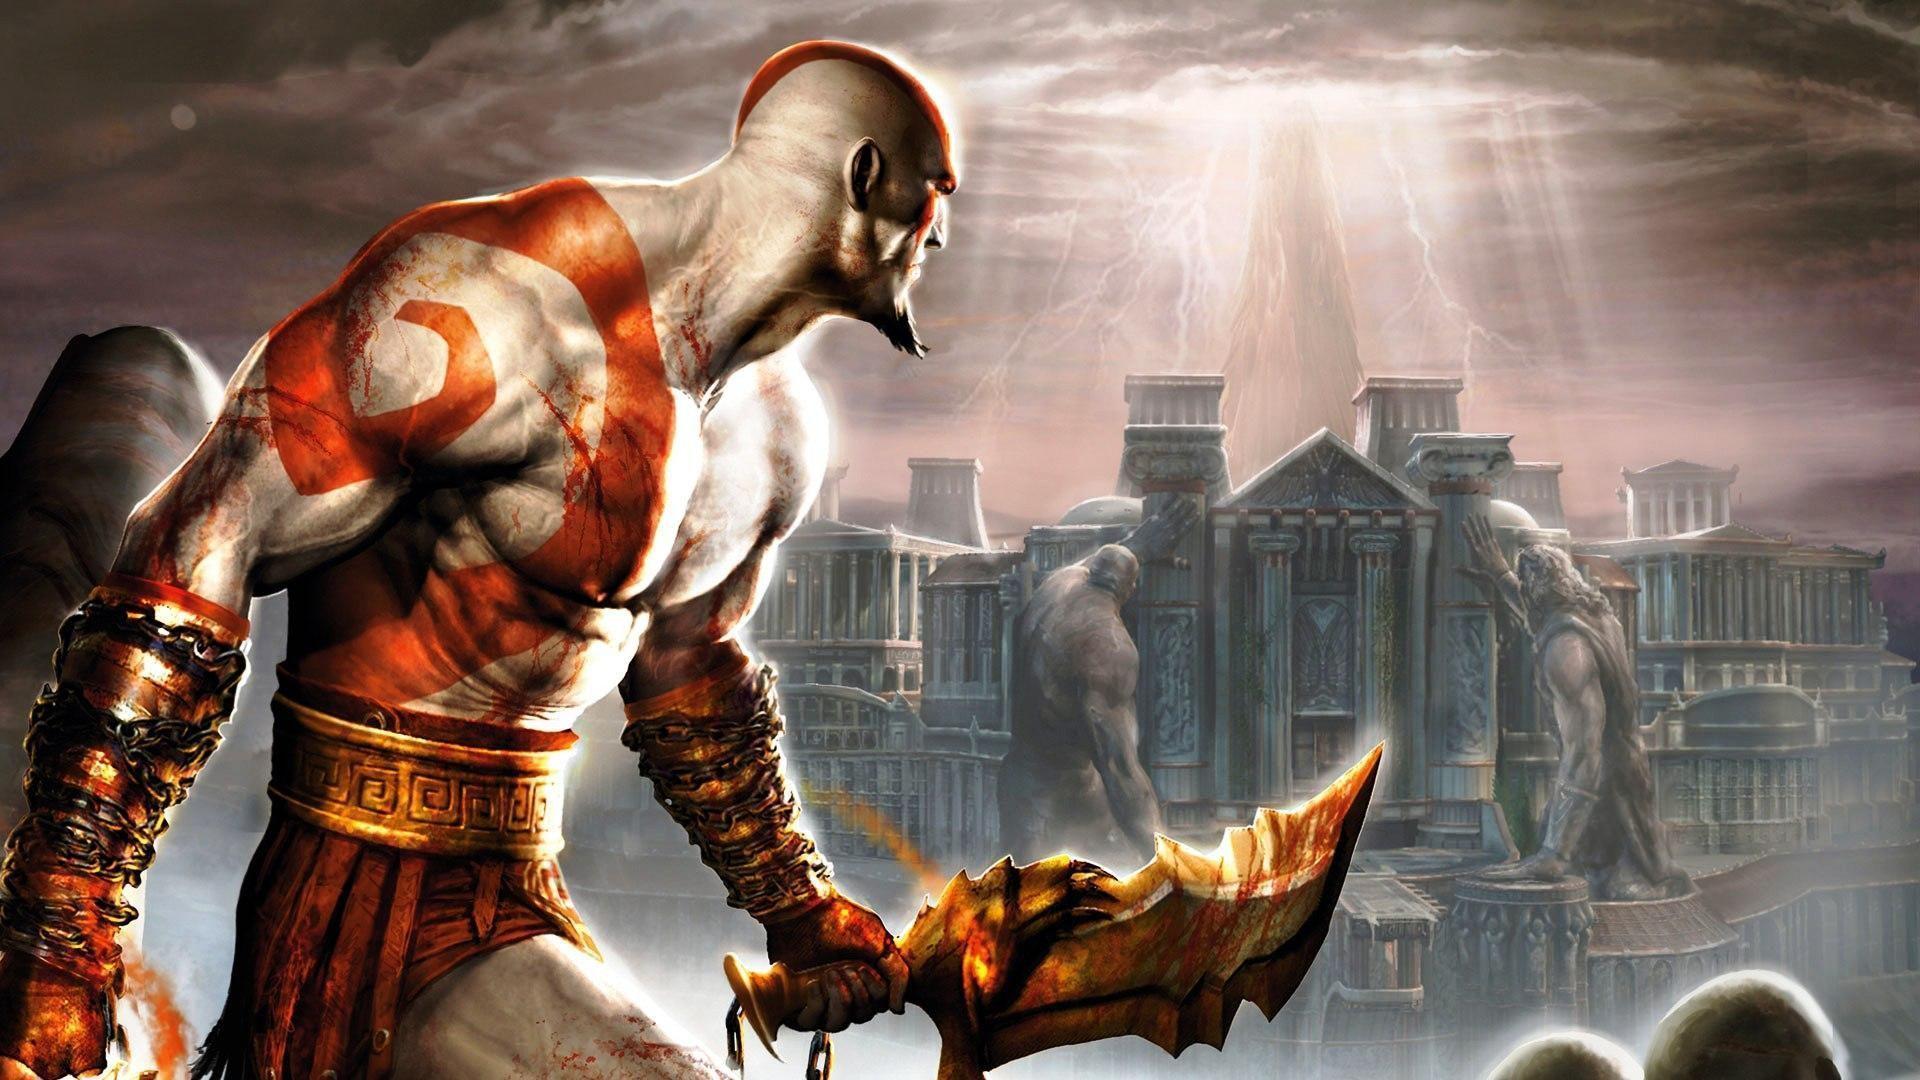 god of war 1 wallpaper hd -#main